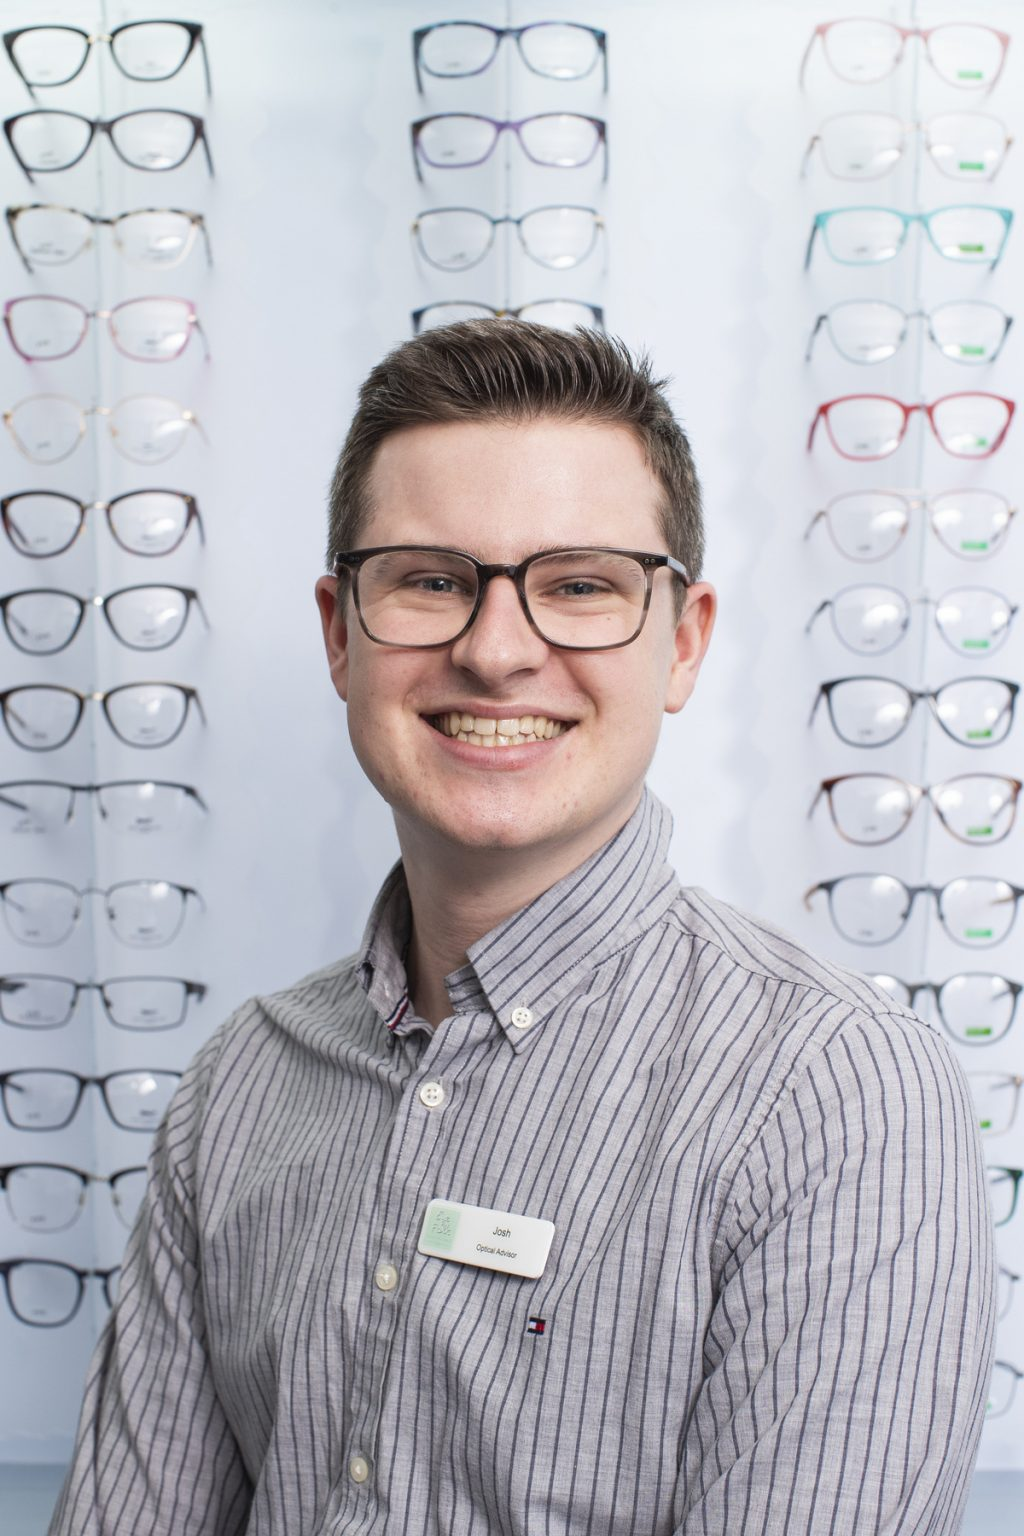 Photo of Josh, a Trainee Dispensing Optician at Eye Folk